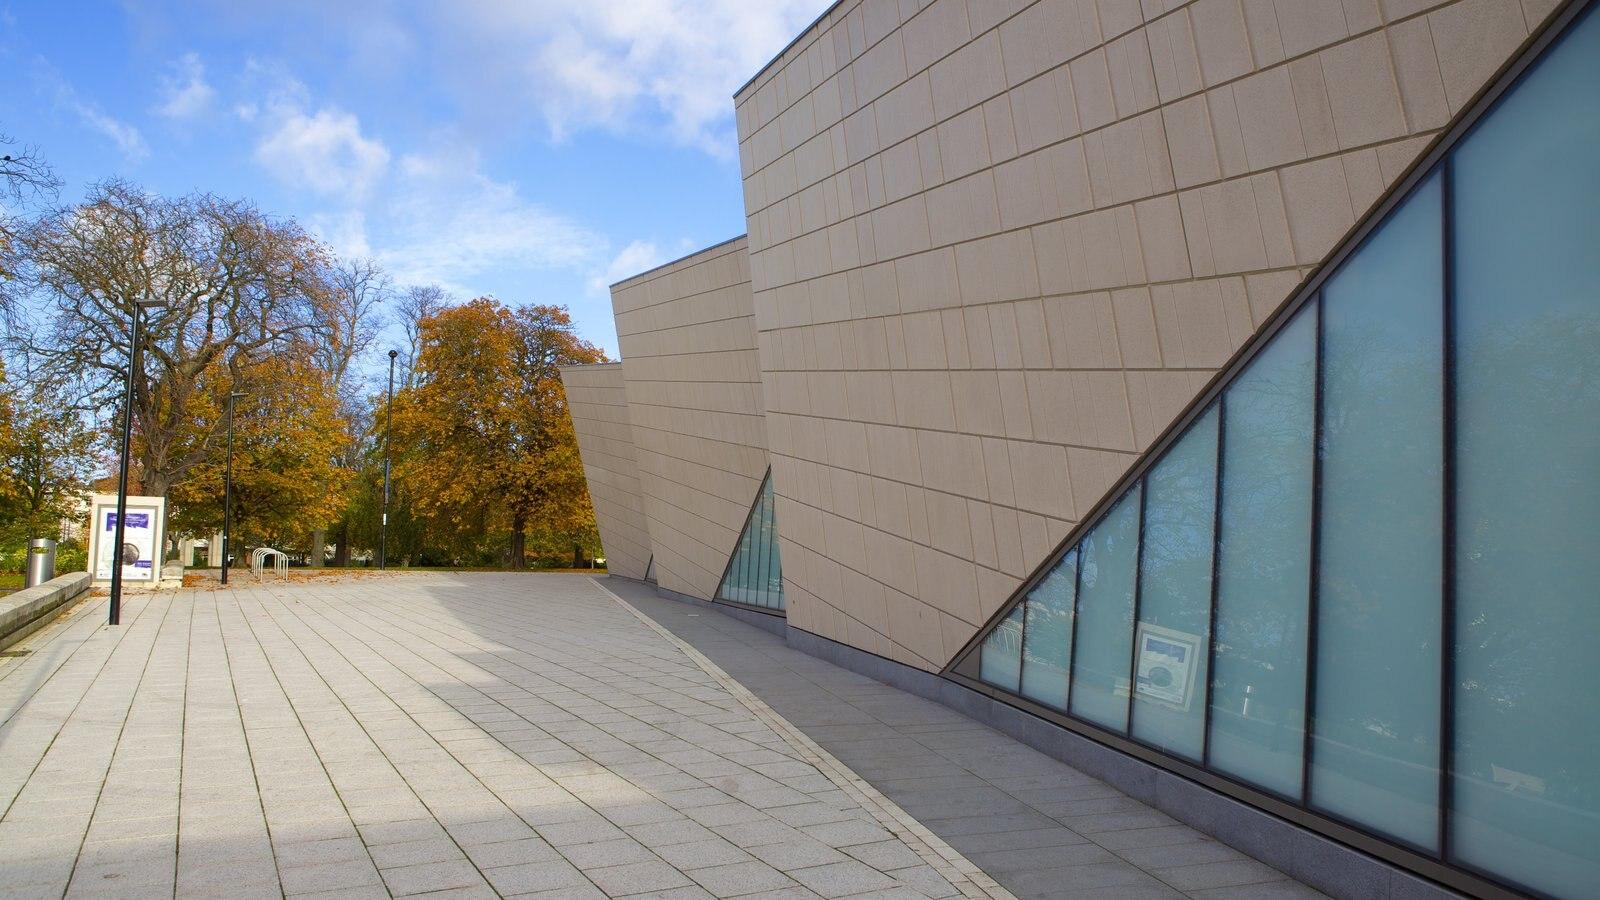 Museo SeaCity que incluye arquitectura moderna